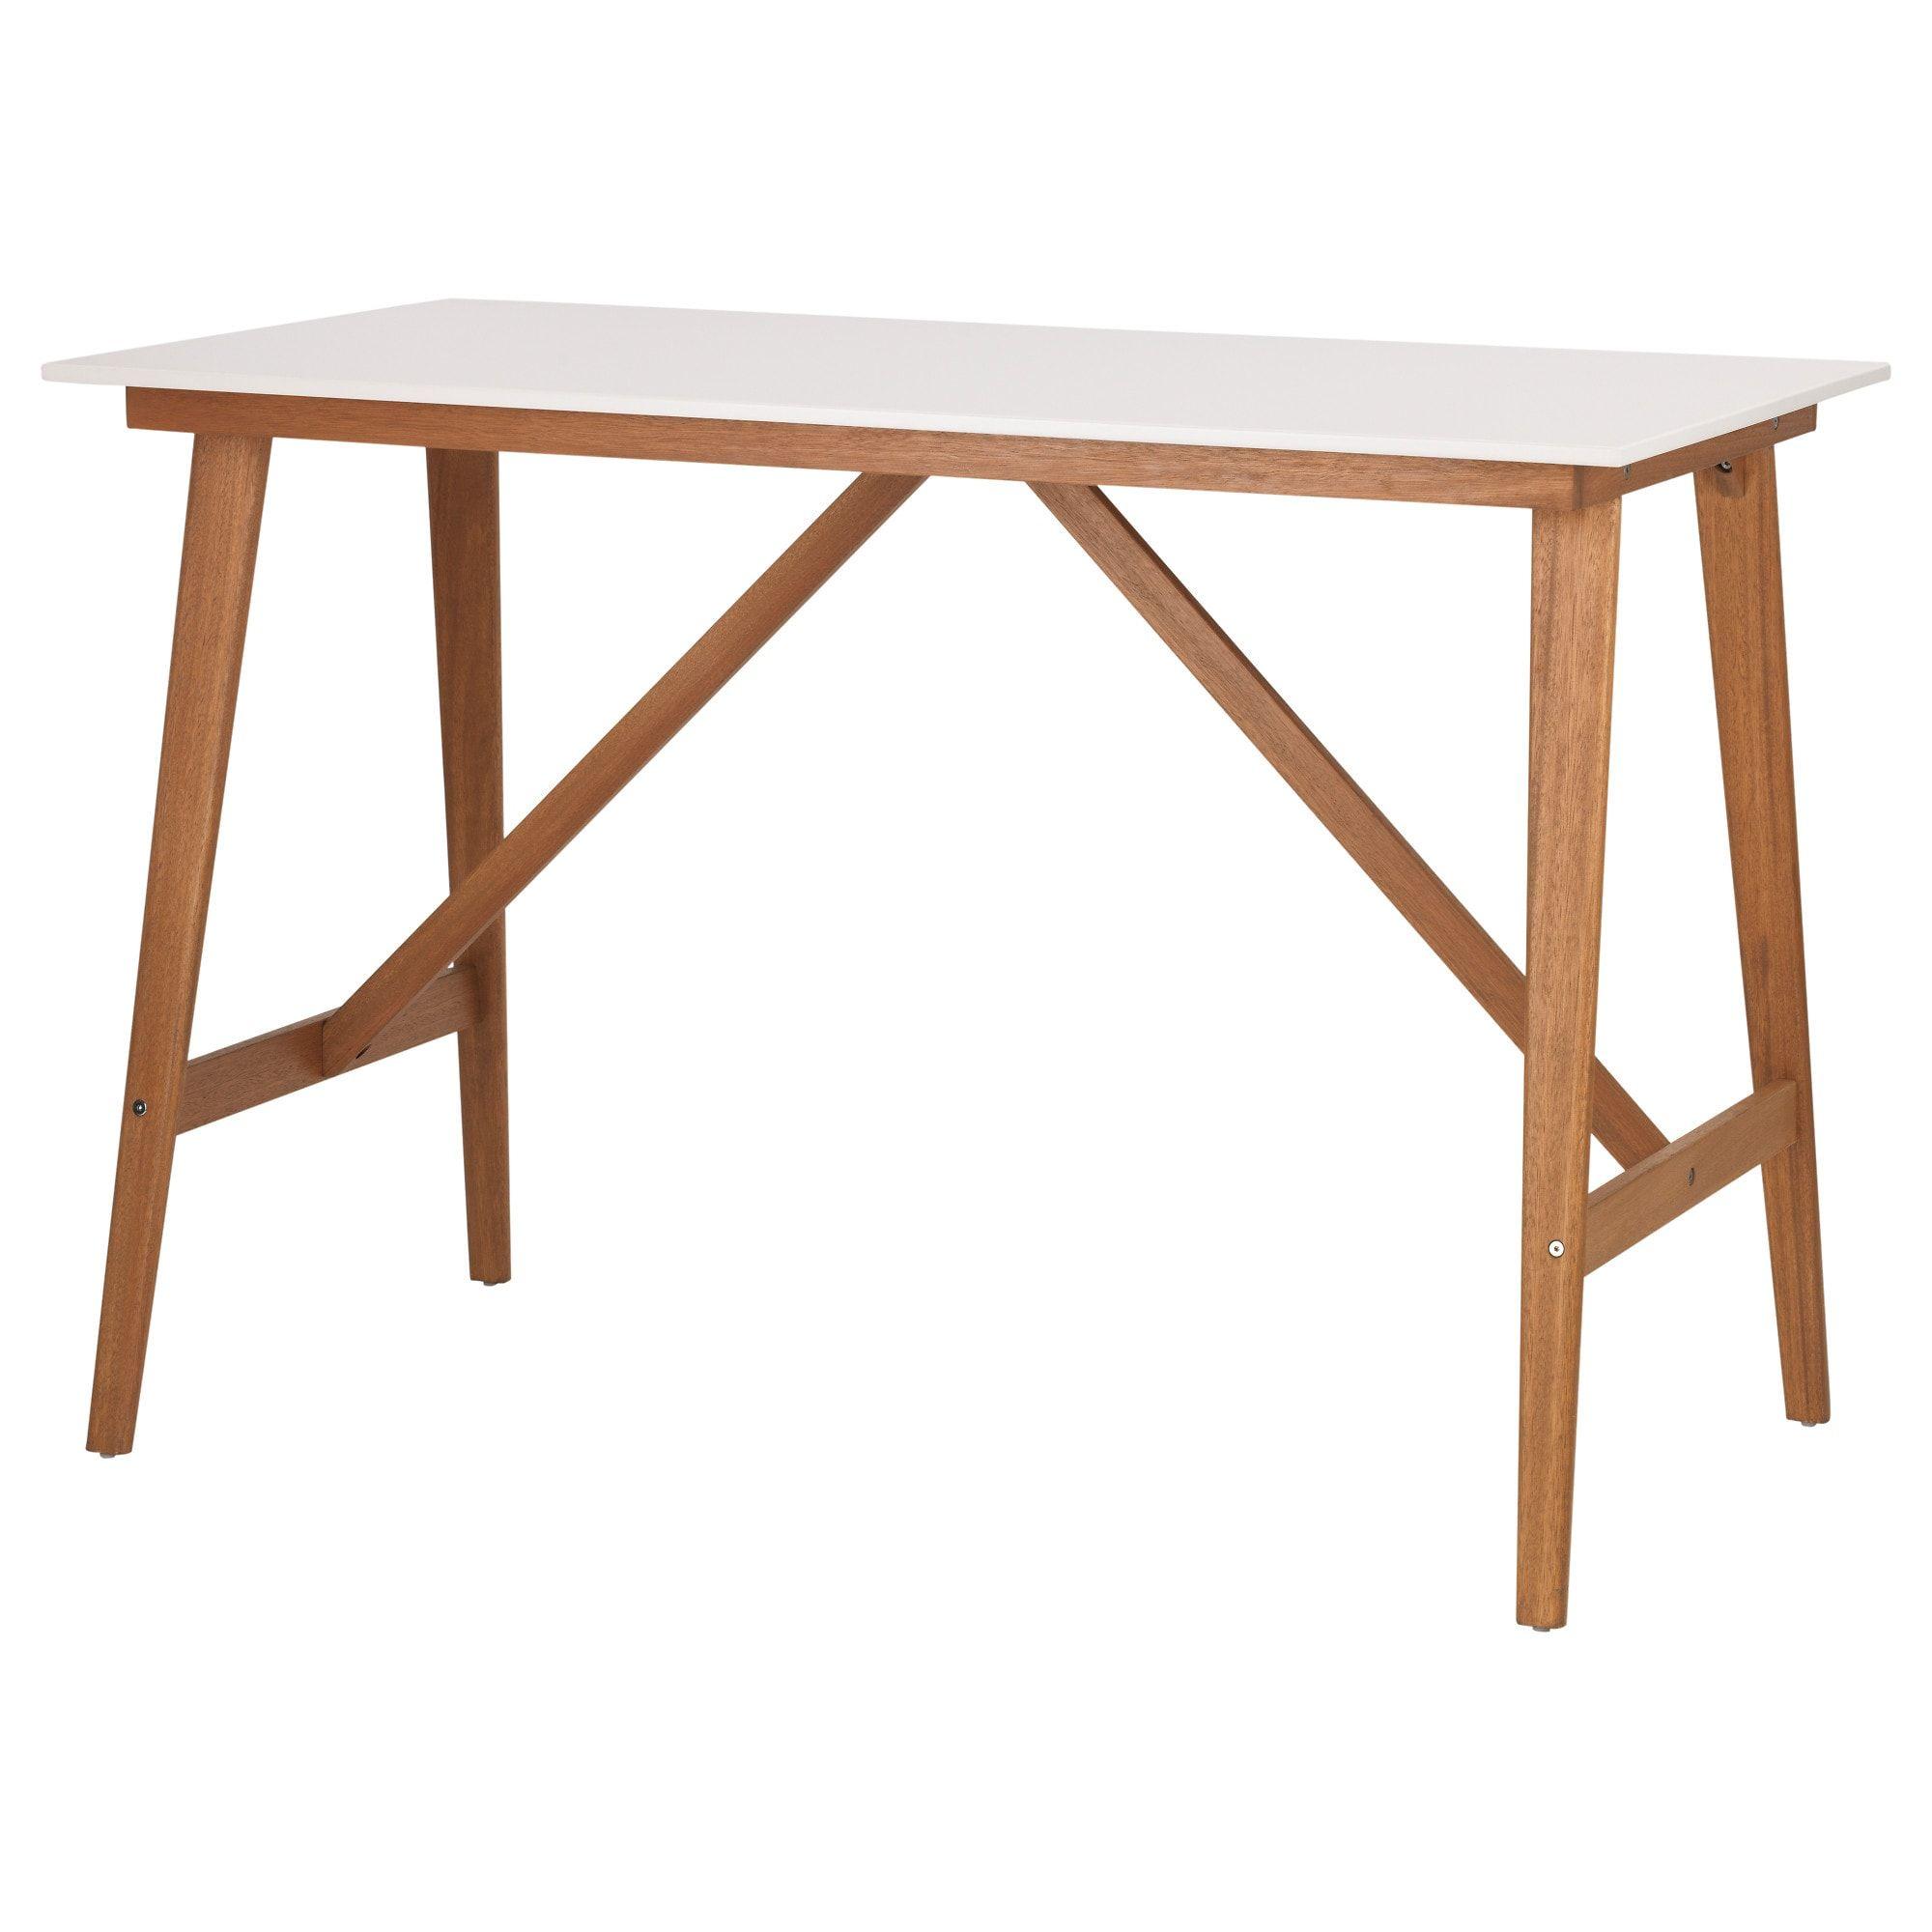 Ikea Fanbyn White Bar Table In 2020 White Bar Table Pub Table